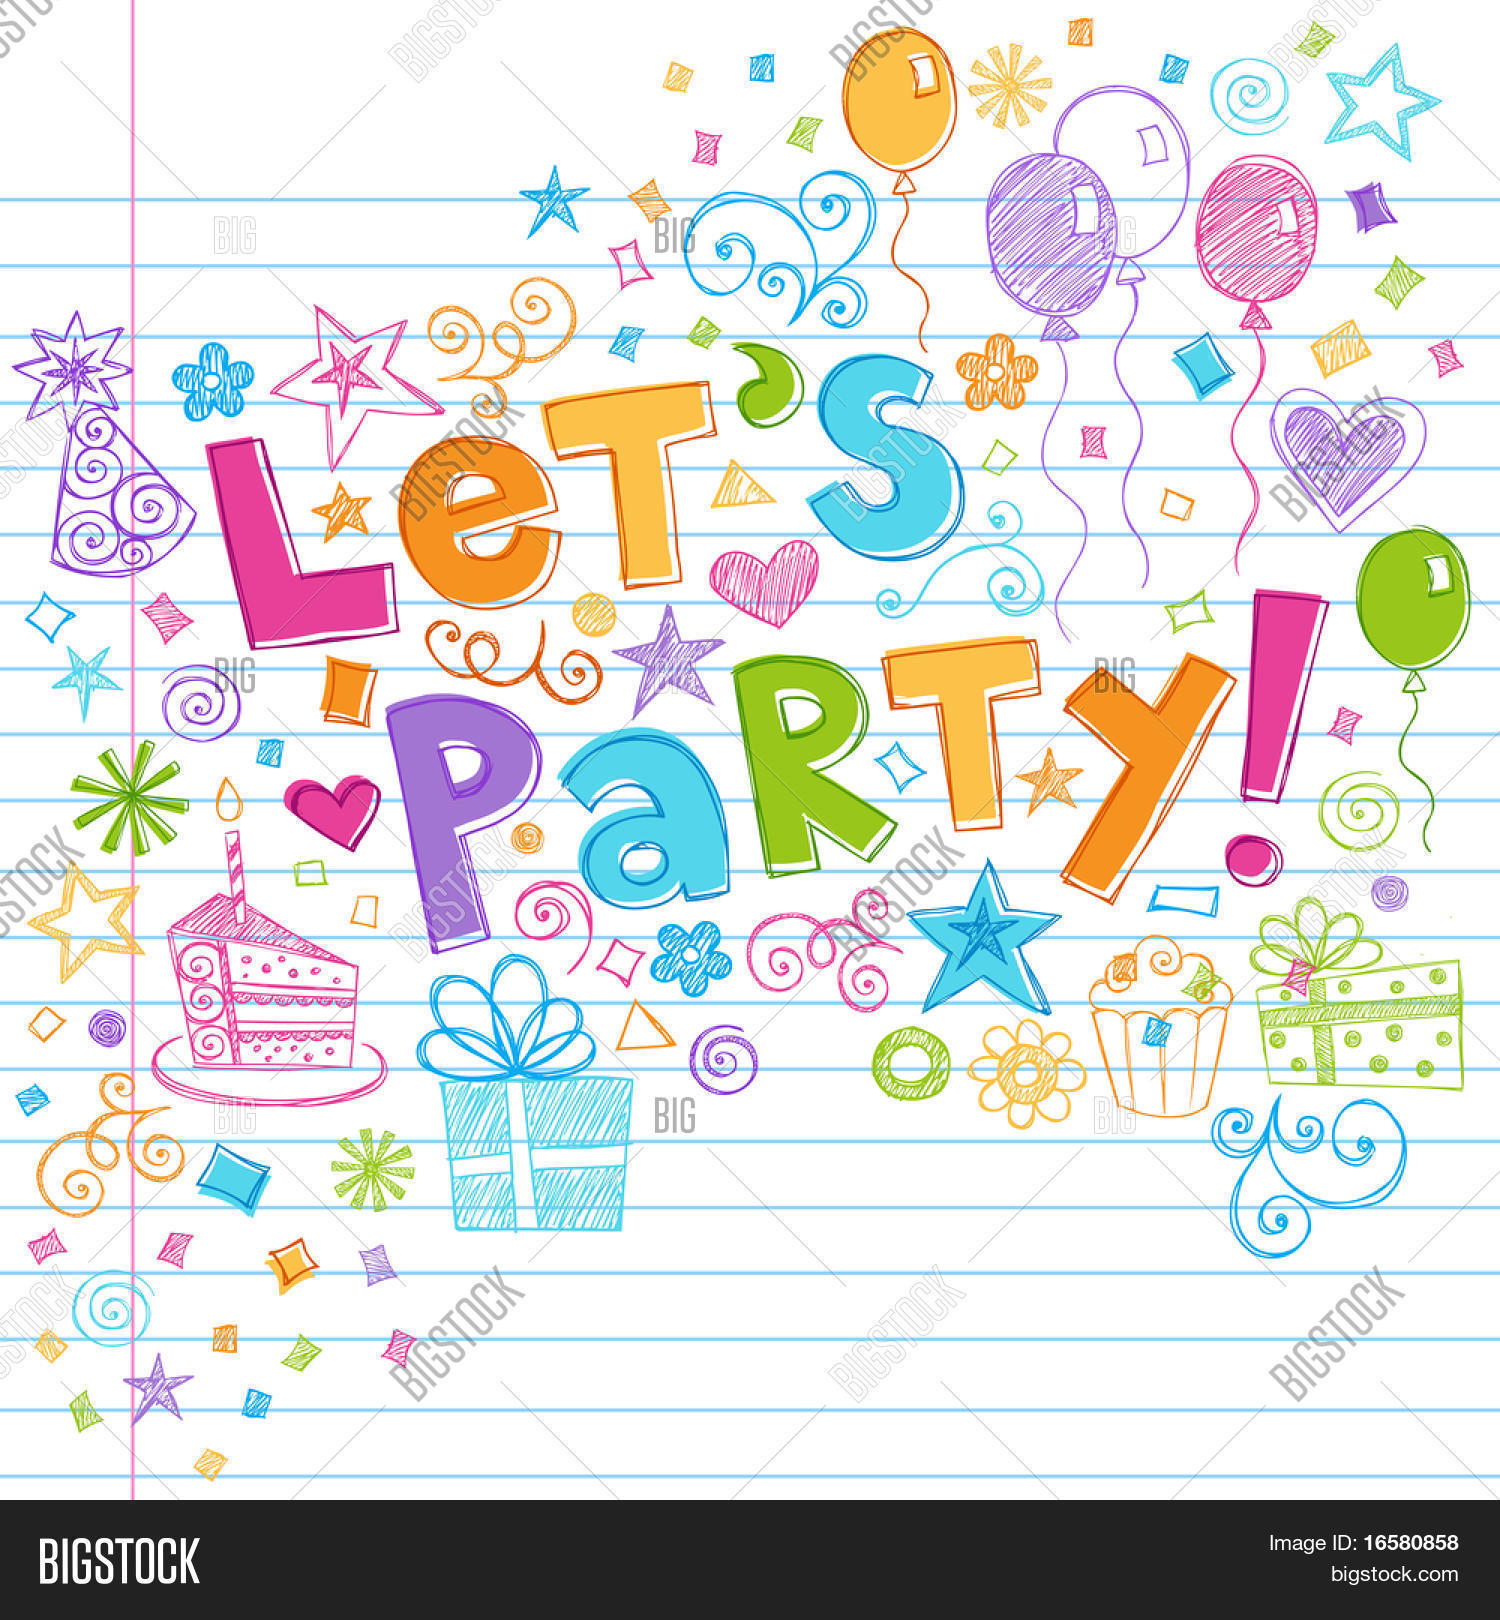 HandDrawn Sketchy Lets Party Vector Photo Bigstock